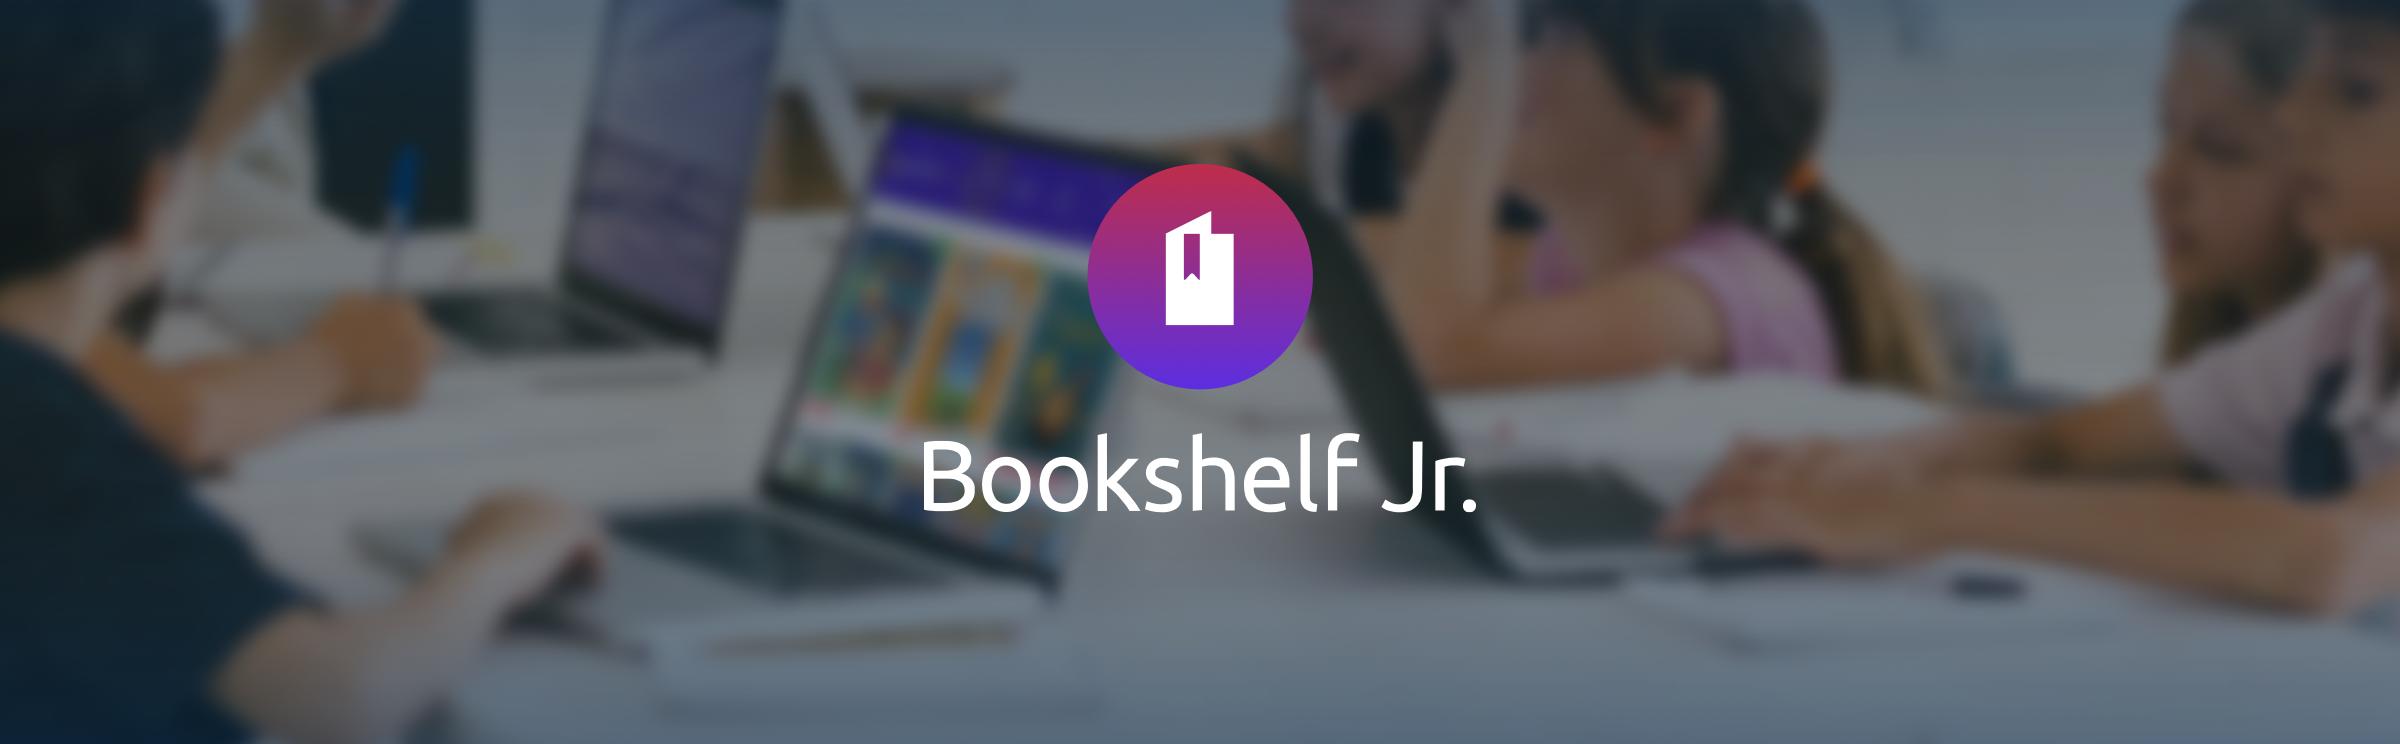 Bookshelf Jr